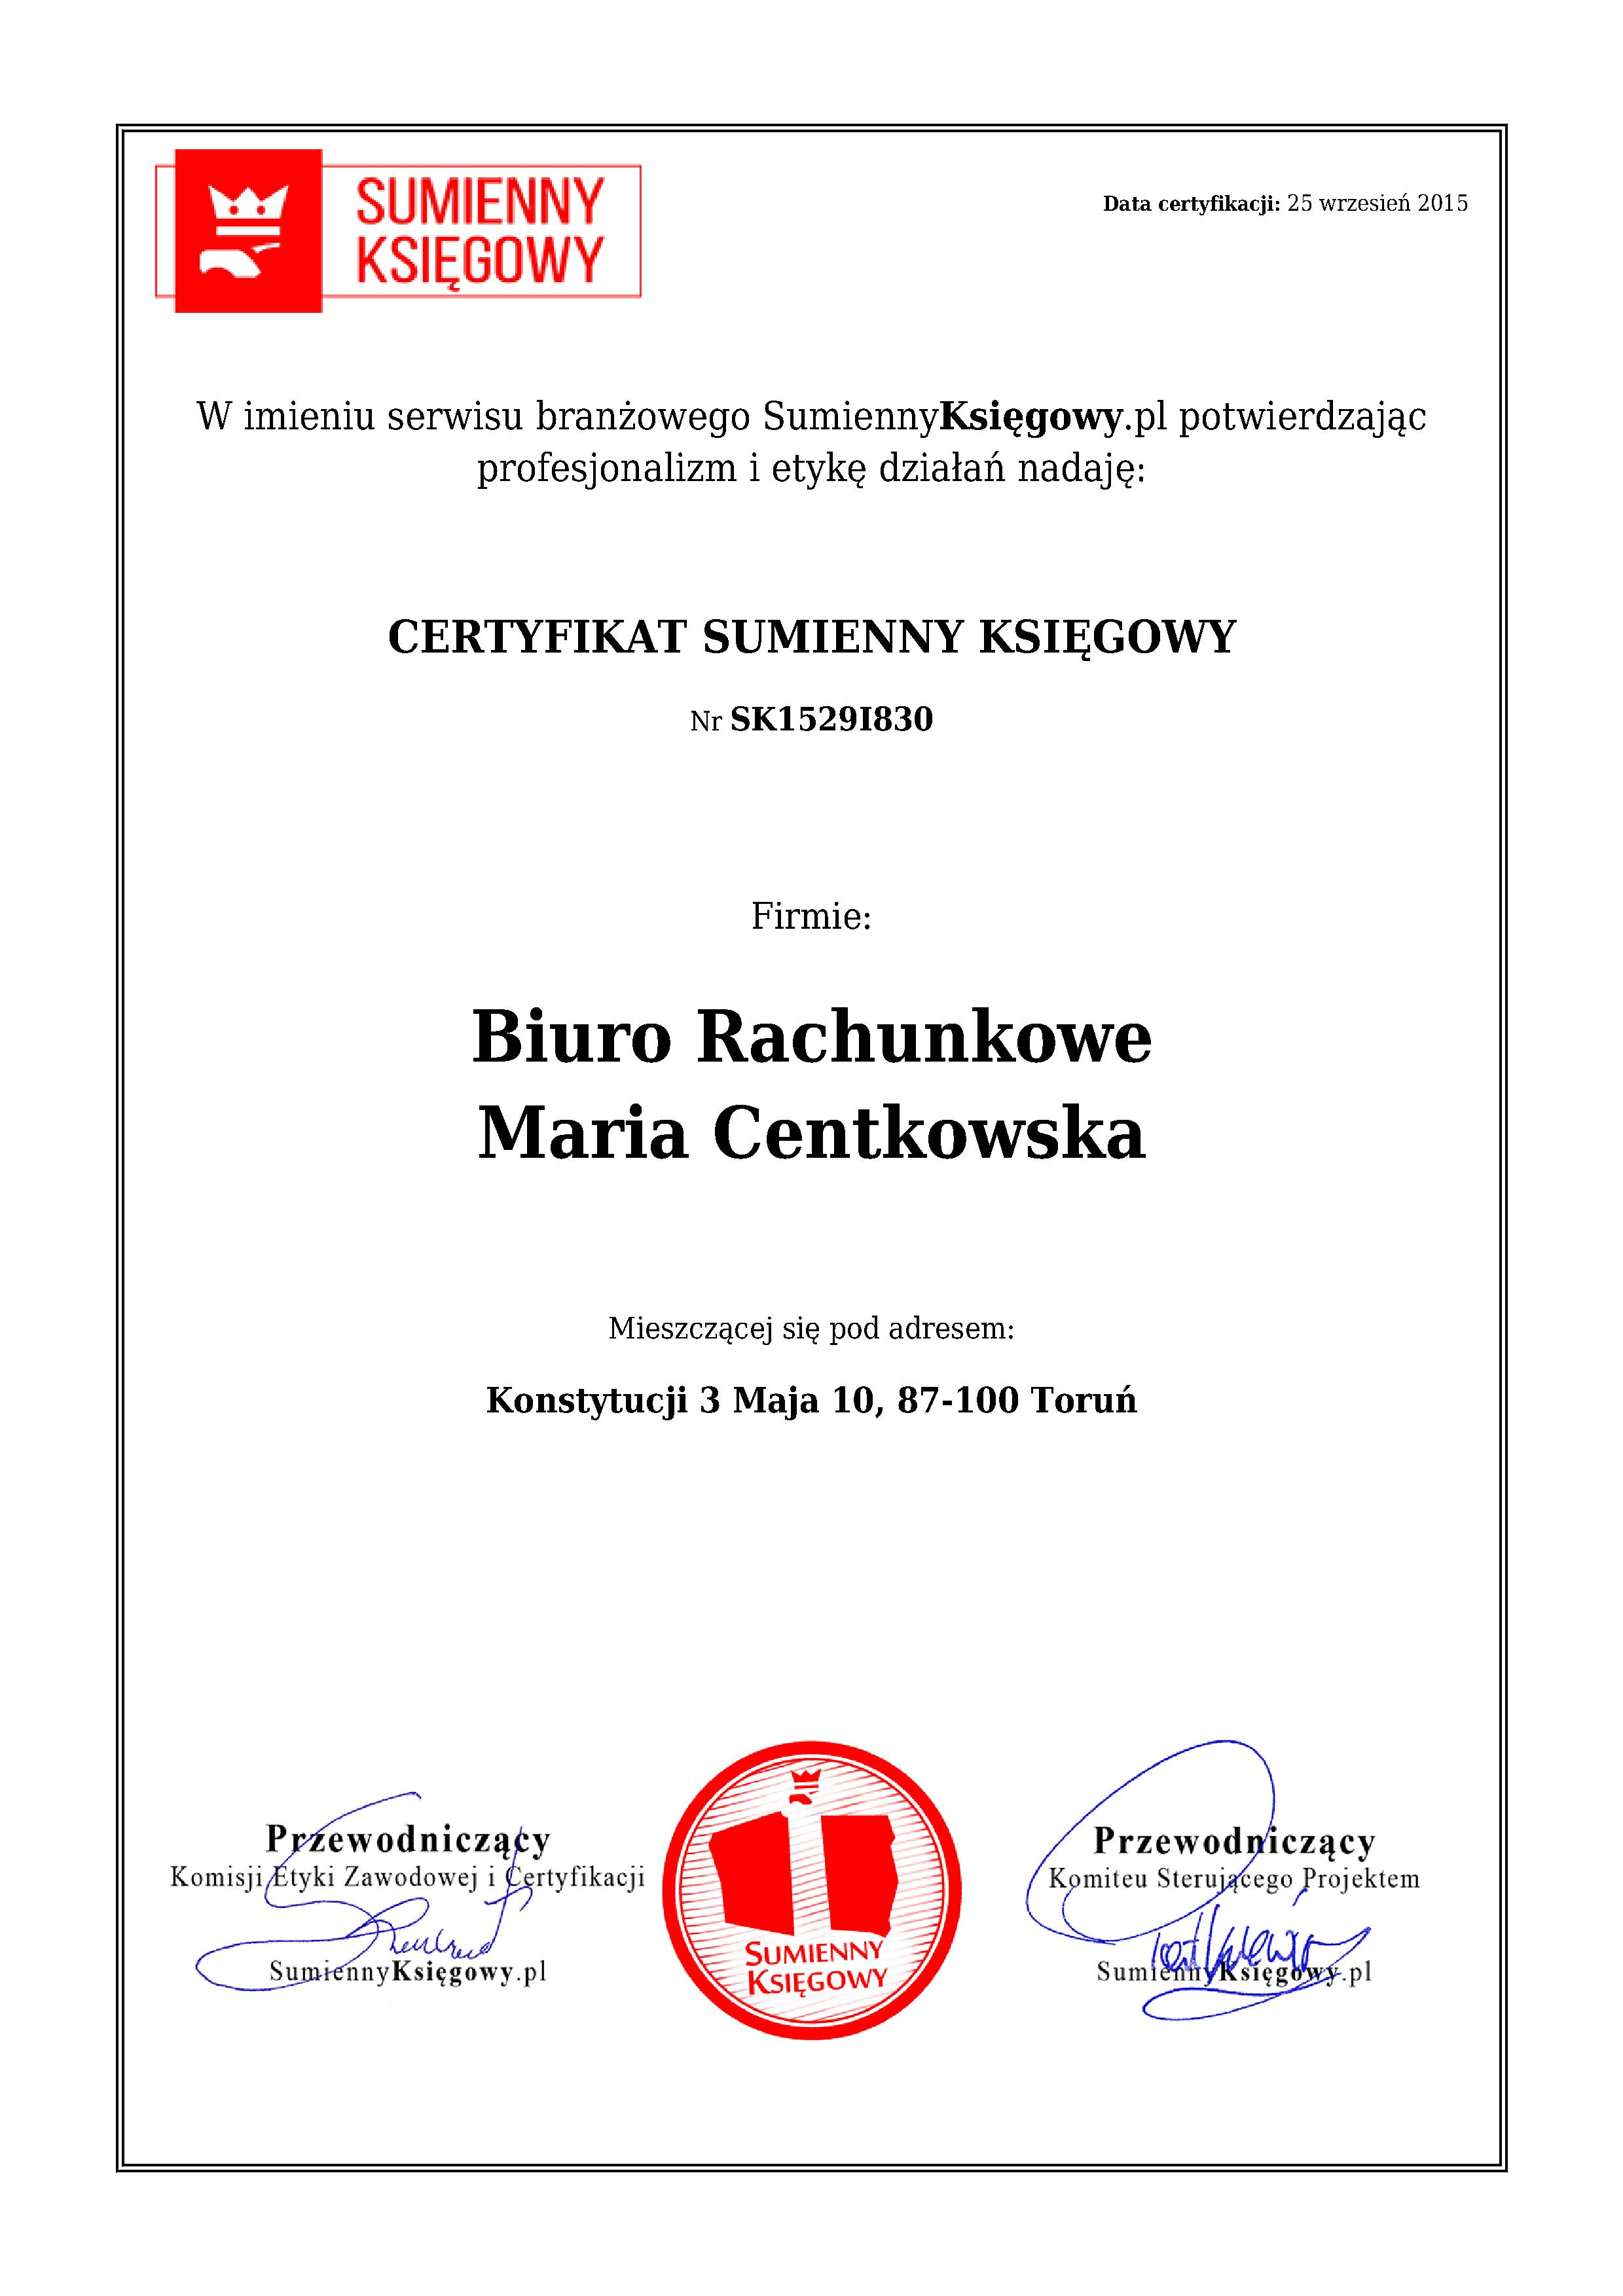 Certyfikat Biuro Rachunkowe Maria Centkowska